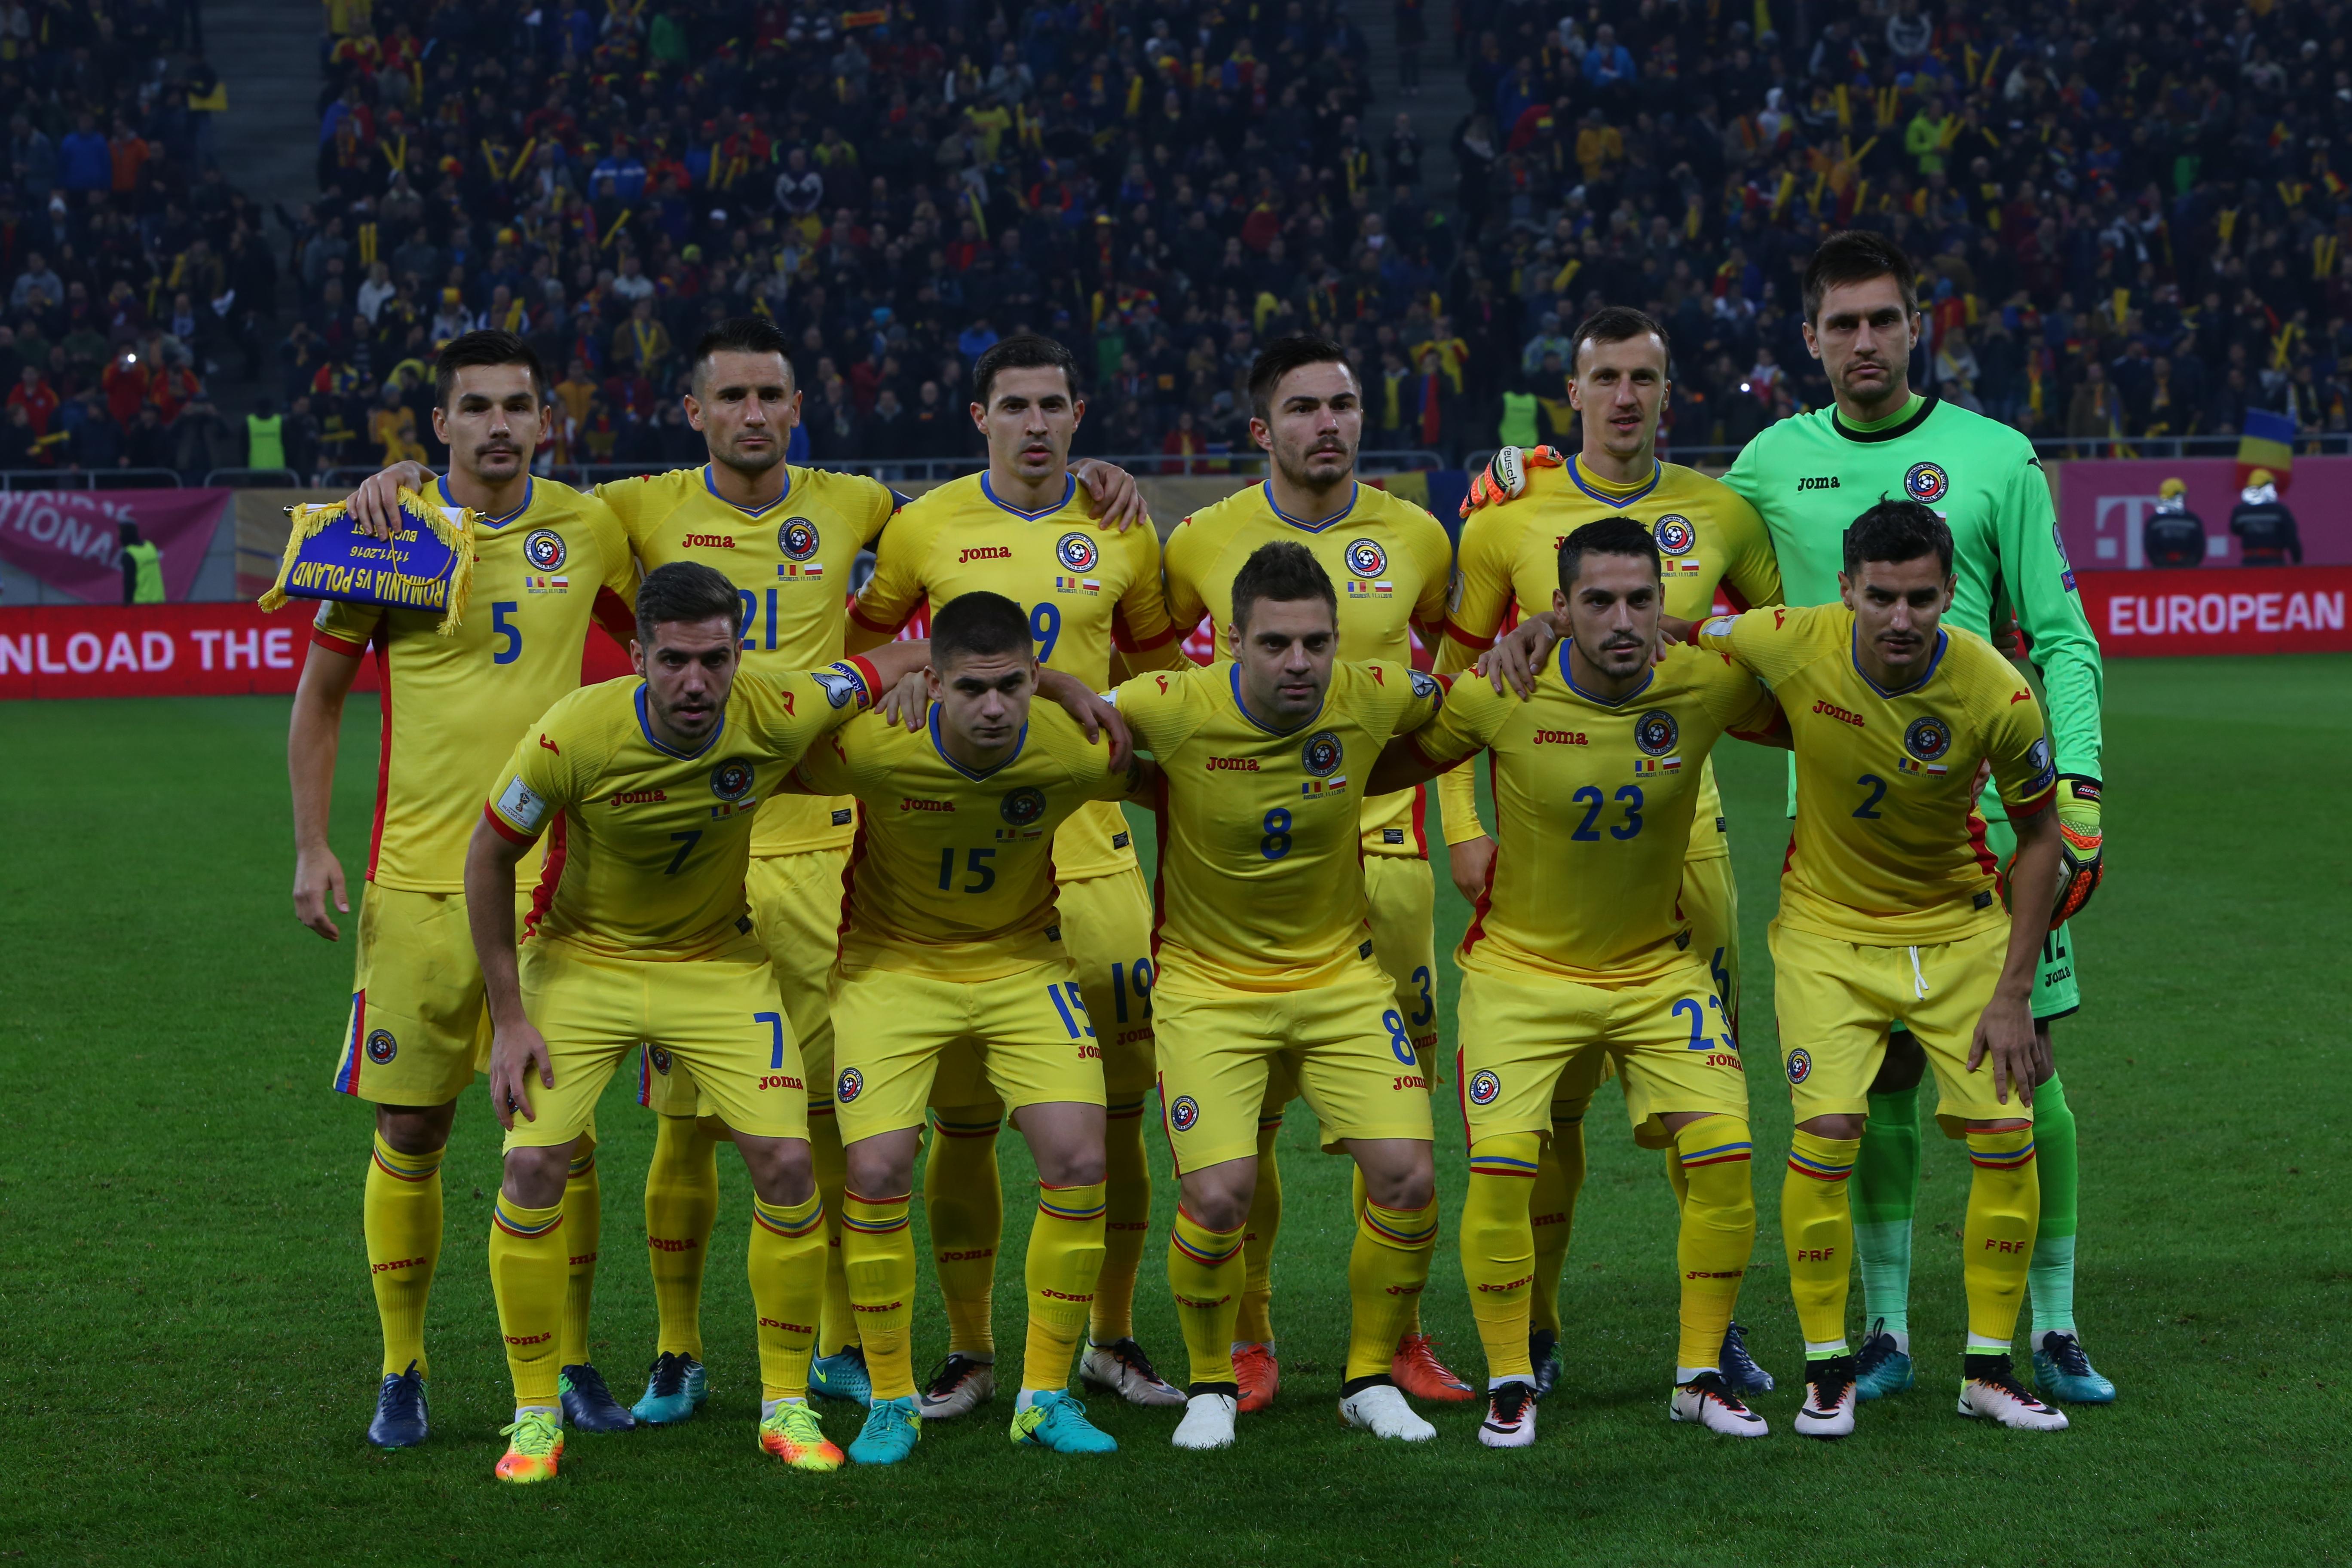 UEFA A Confirmat Că România Va Face Parte Din Urna A Treia